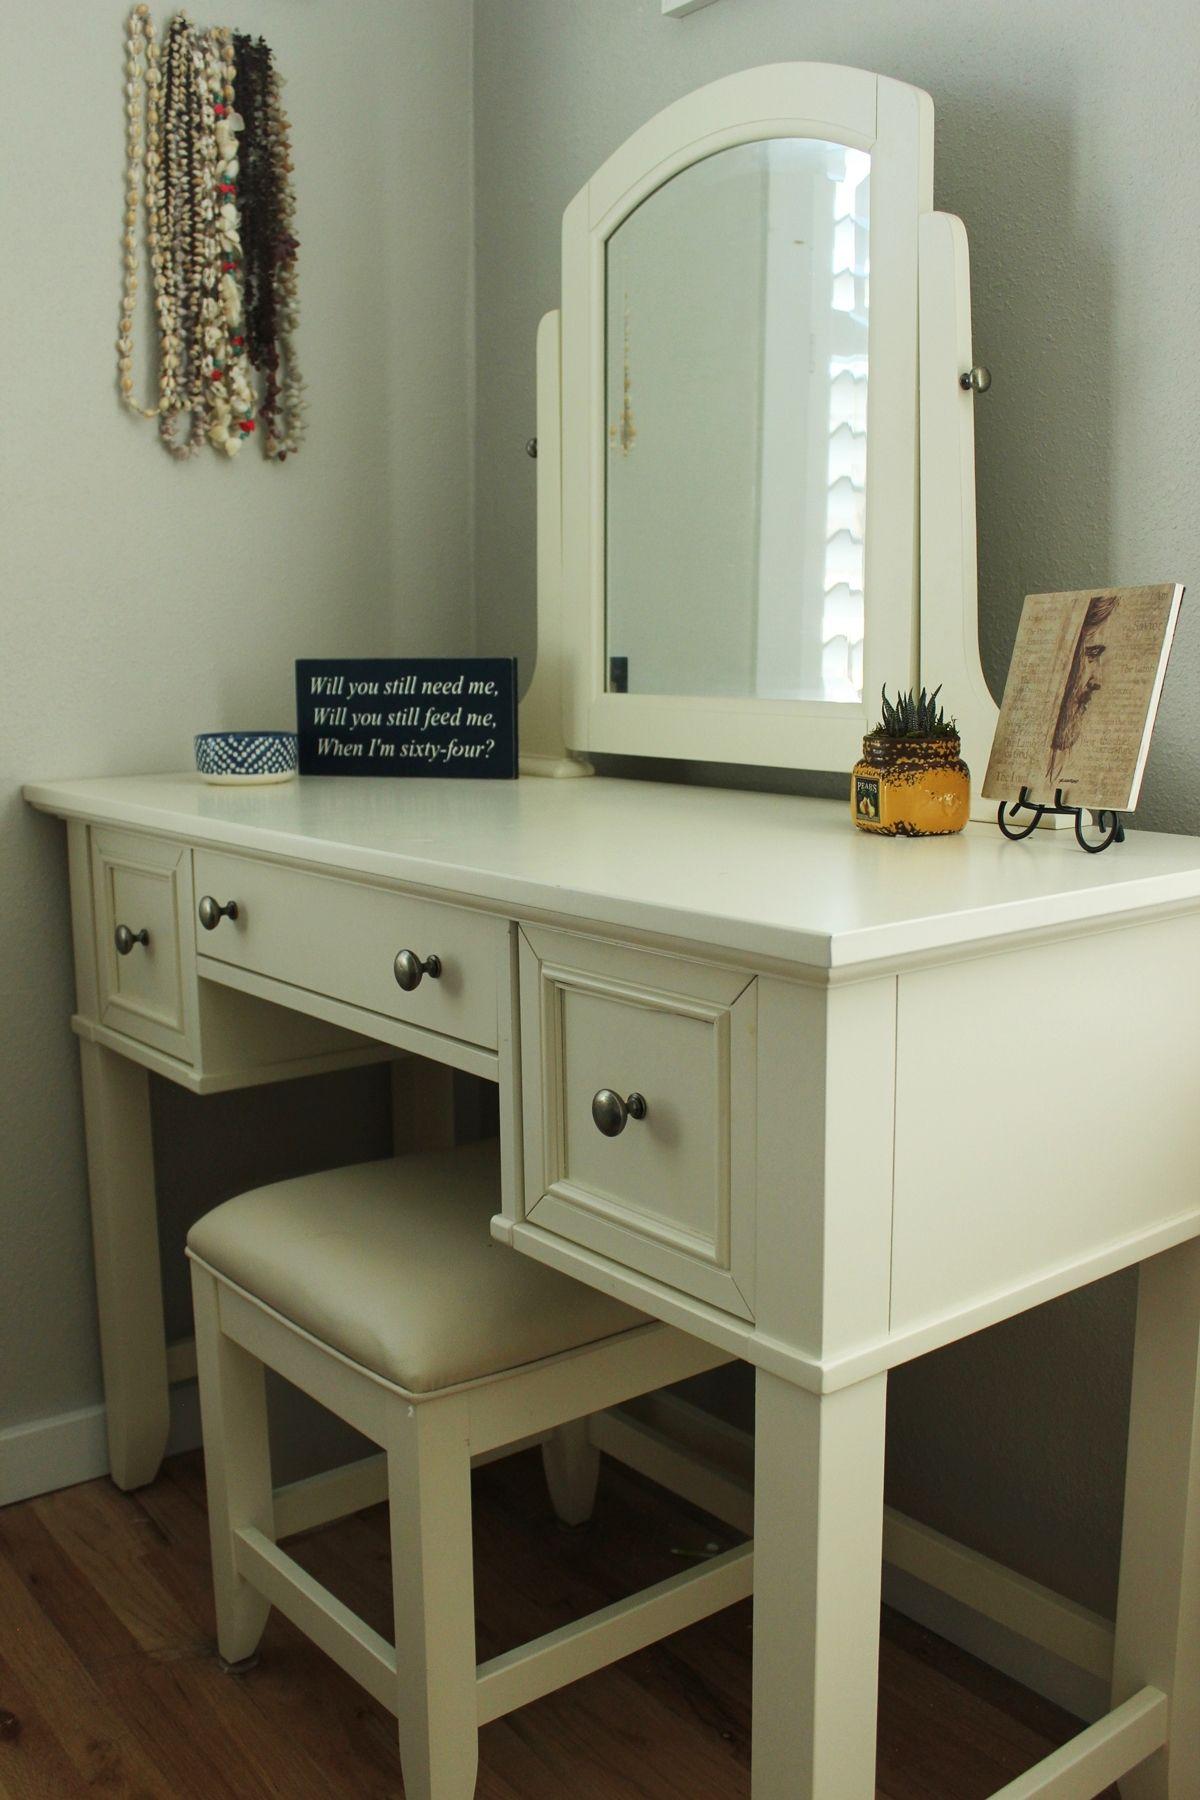 Bedroom with white vanity